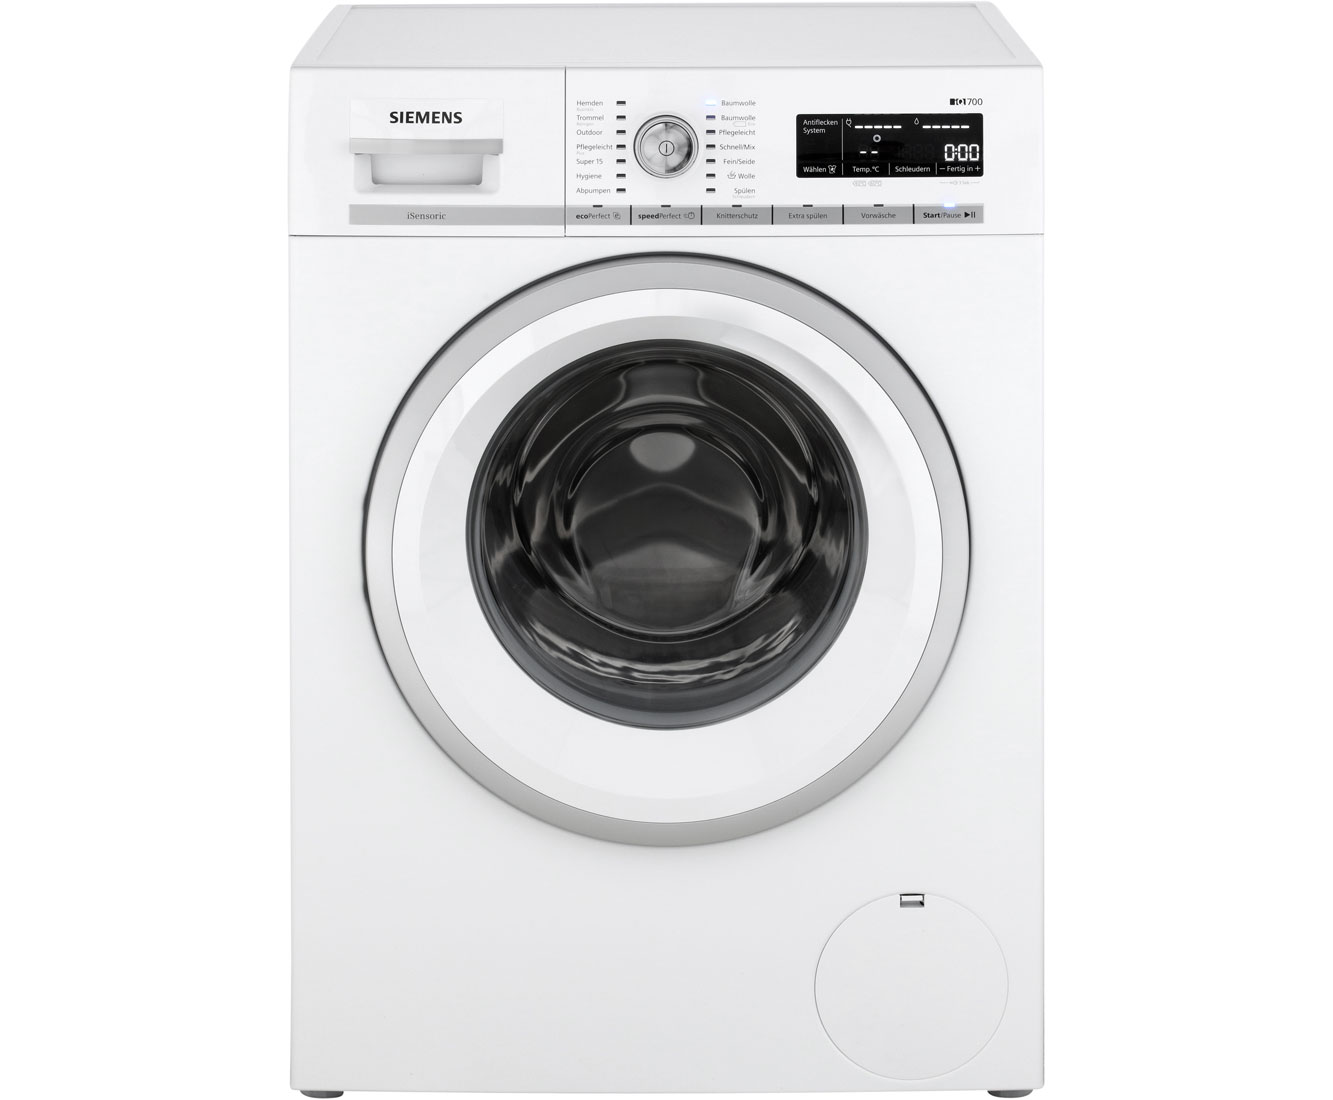 iQ700 WM14W570 Waschmaschinen - Weiss